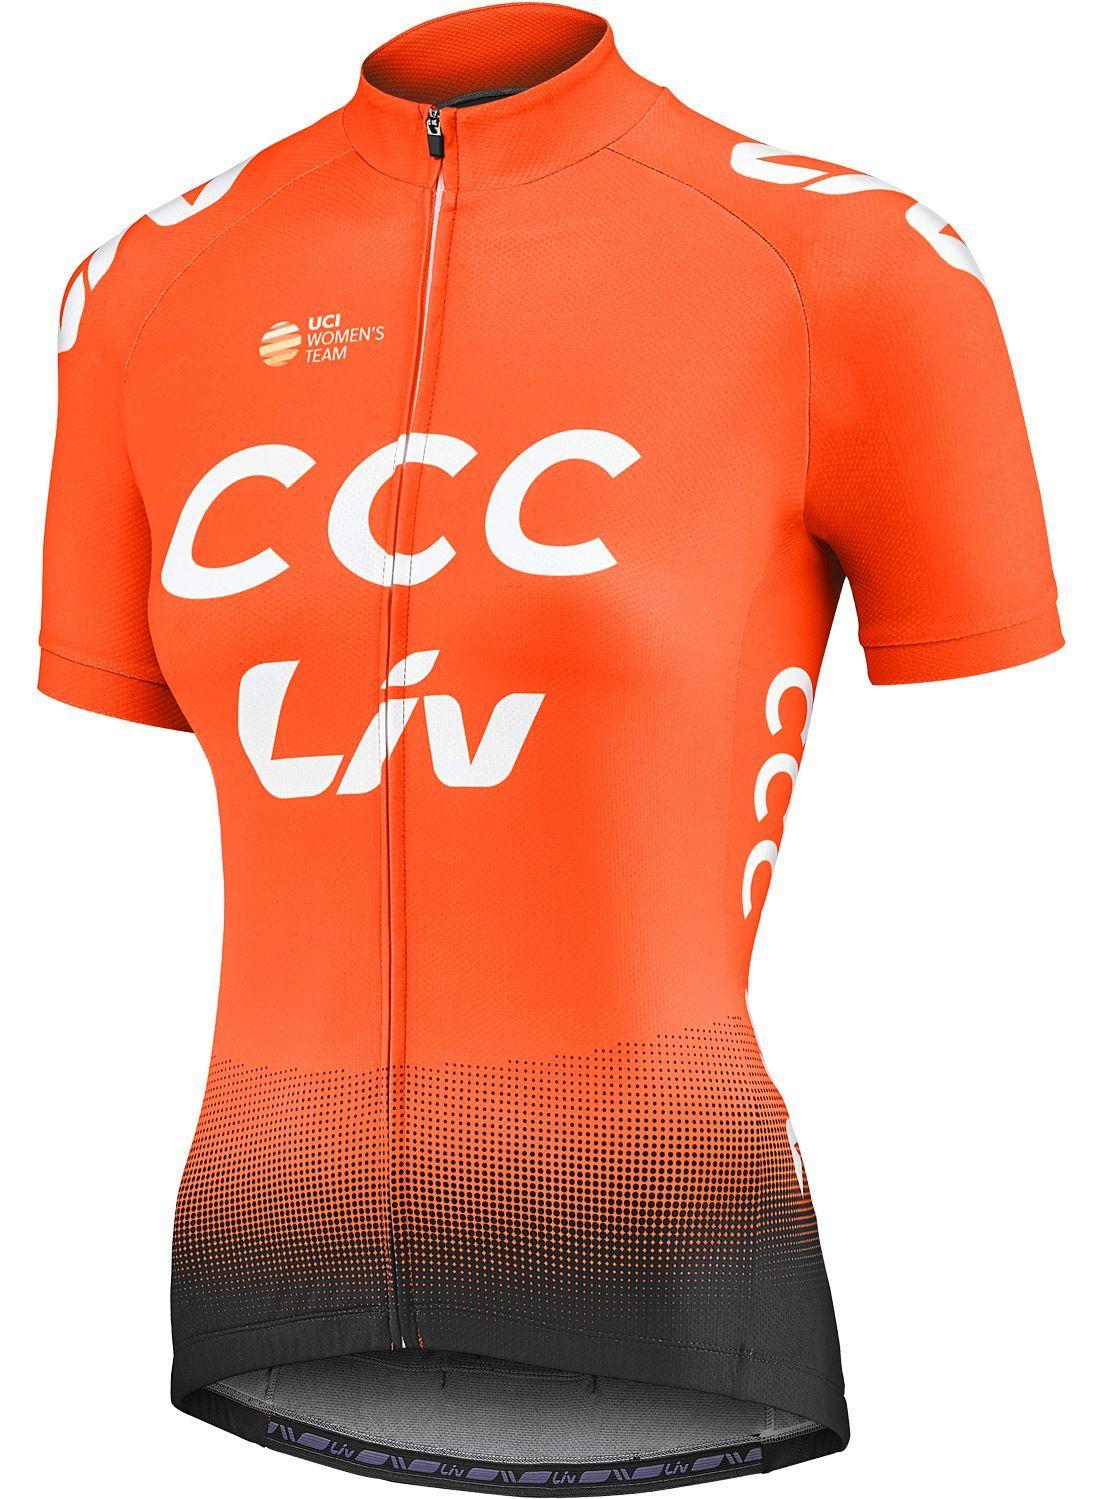 d65b9025 CCC - LIV TEAM 2019 REPLICA womens set (jersey + shorts) - professional  cycling team